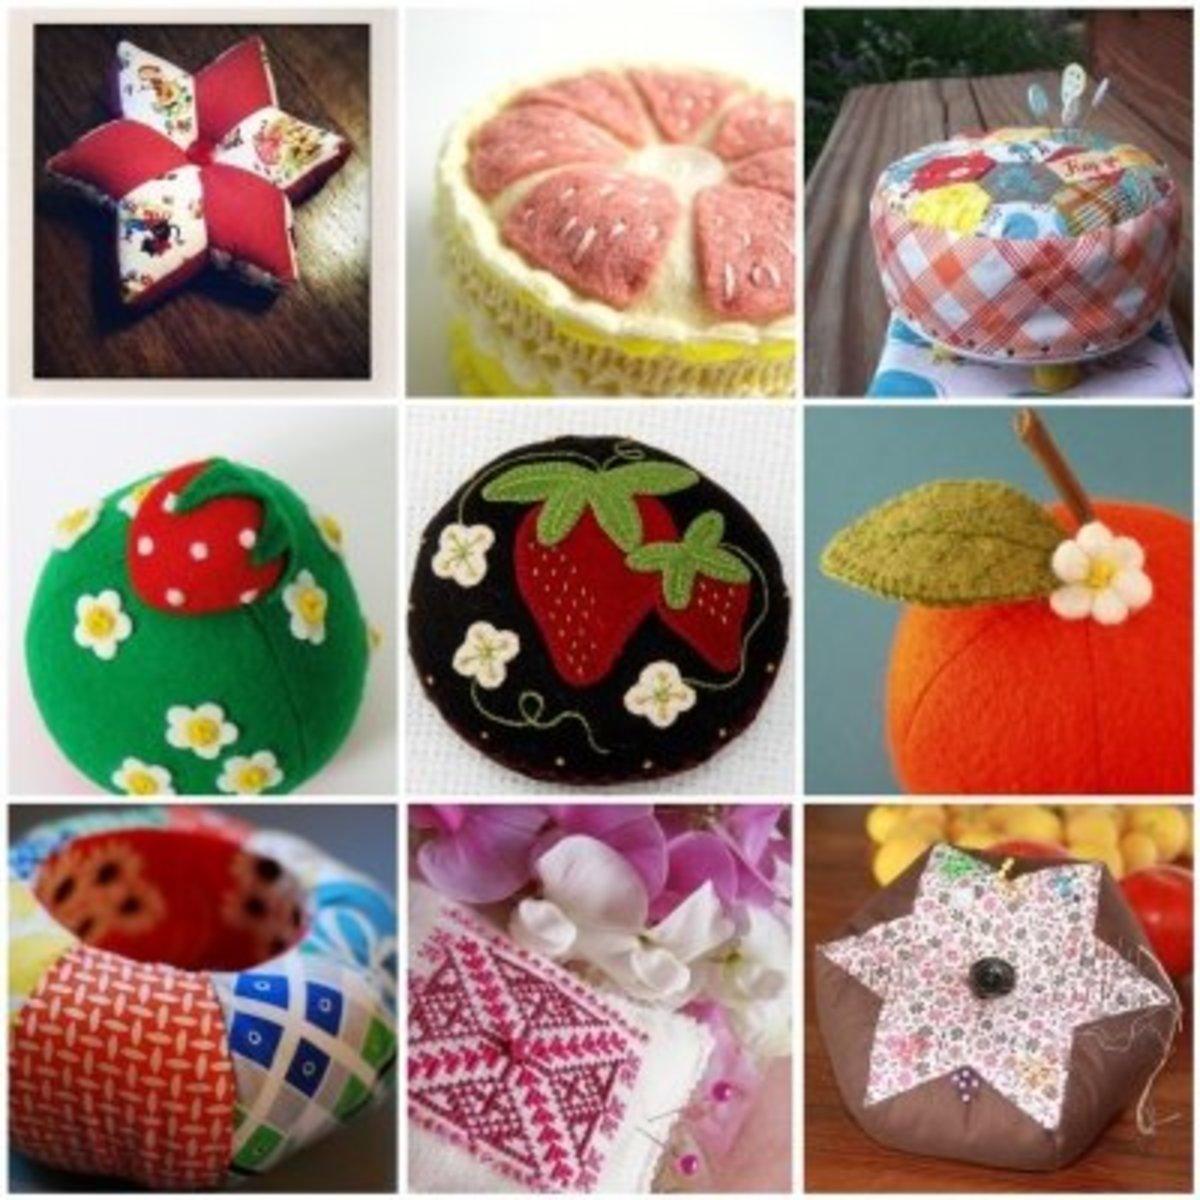 Adorable Handmade Pincushions